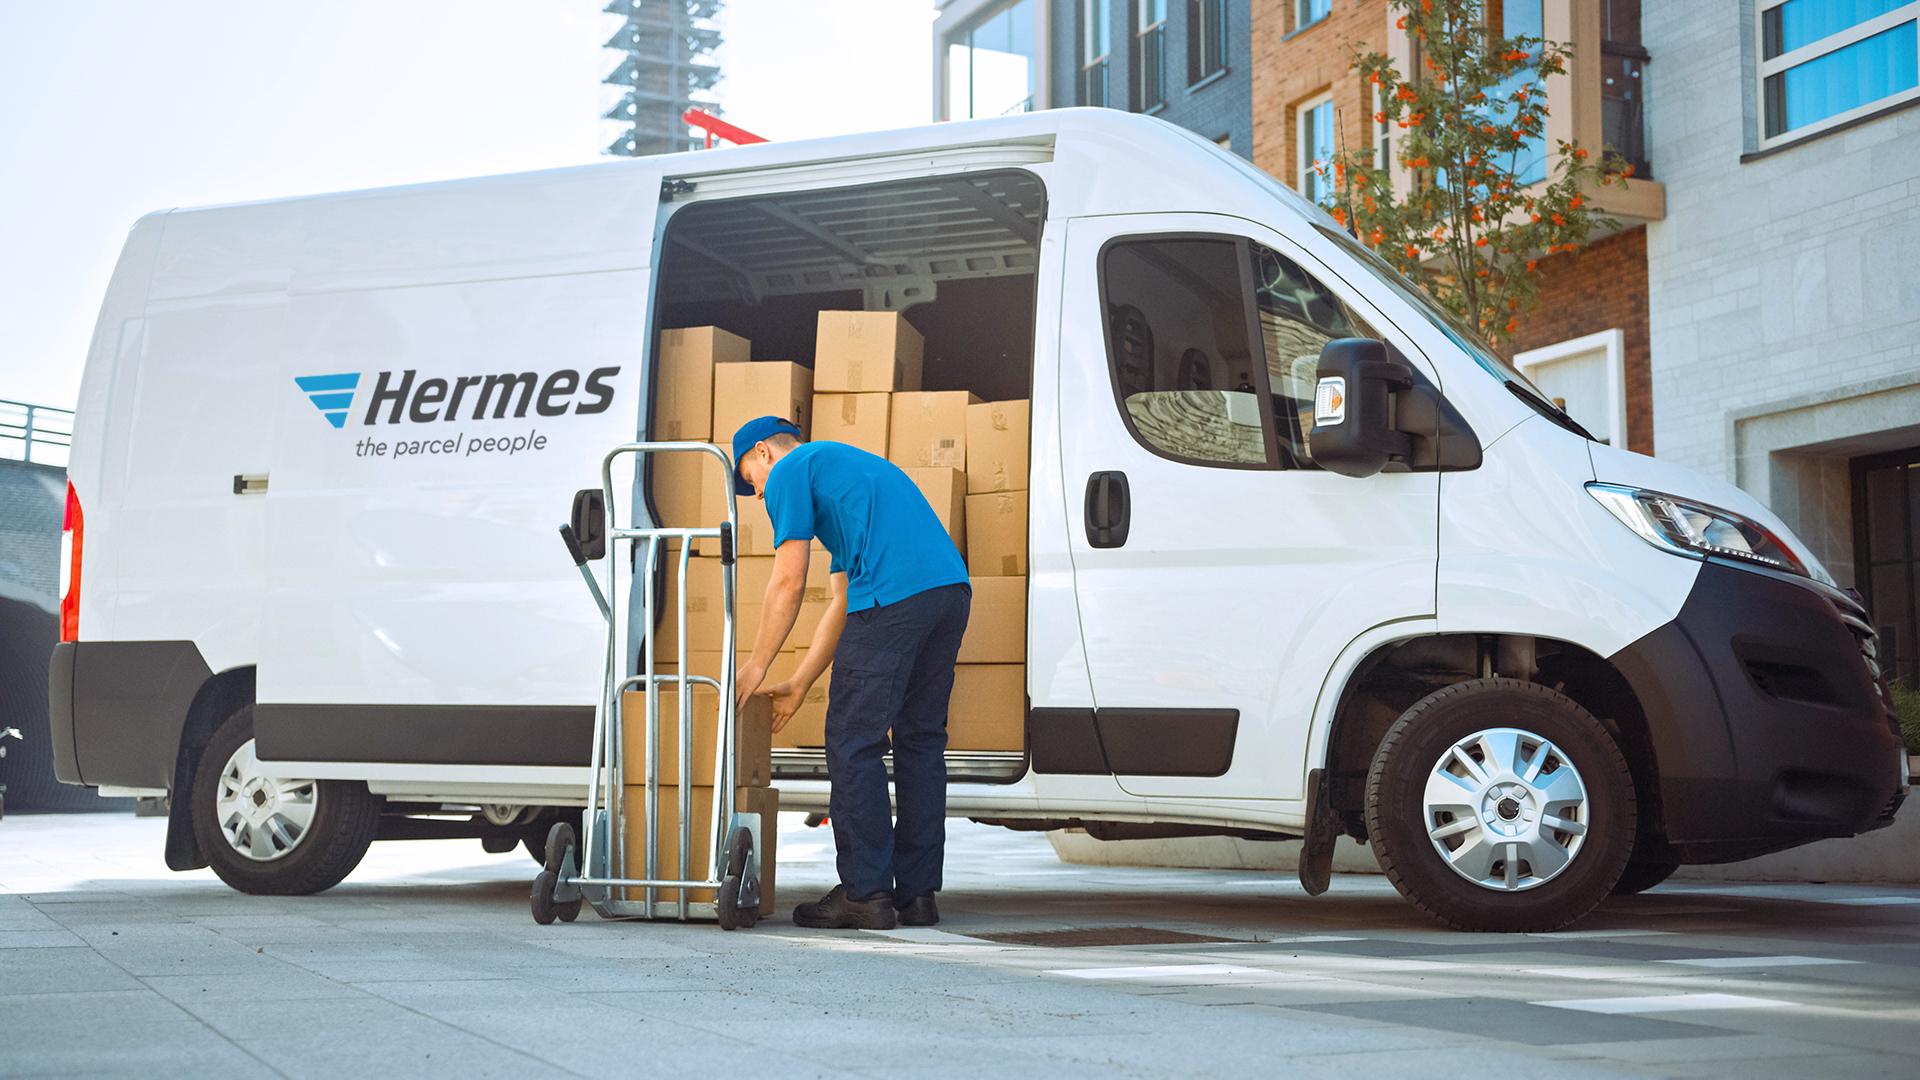 Hermes dropping off parcel